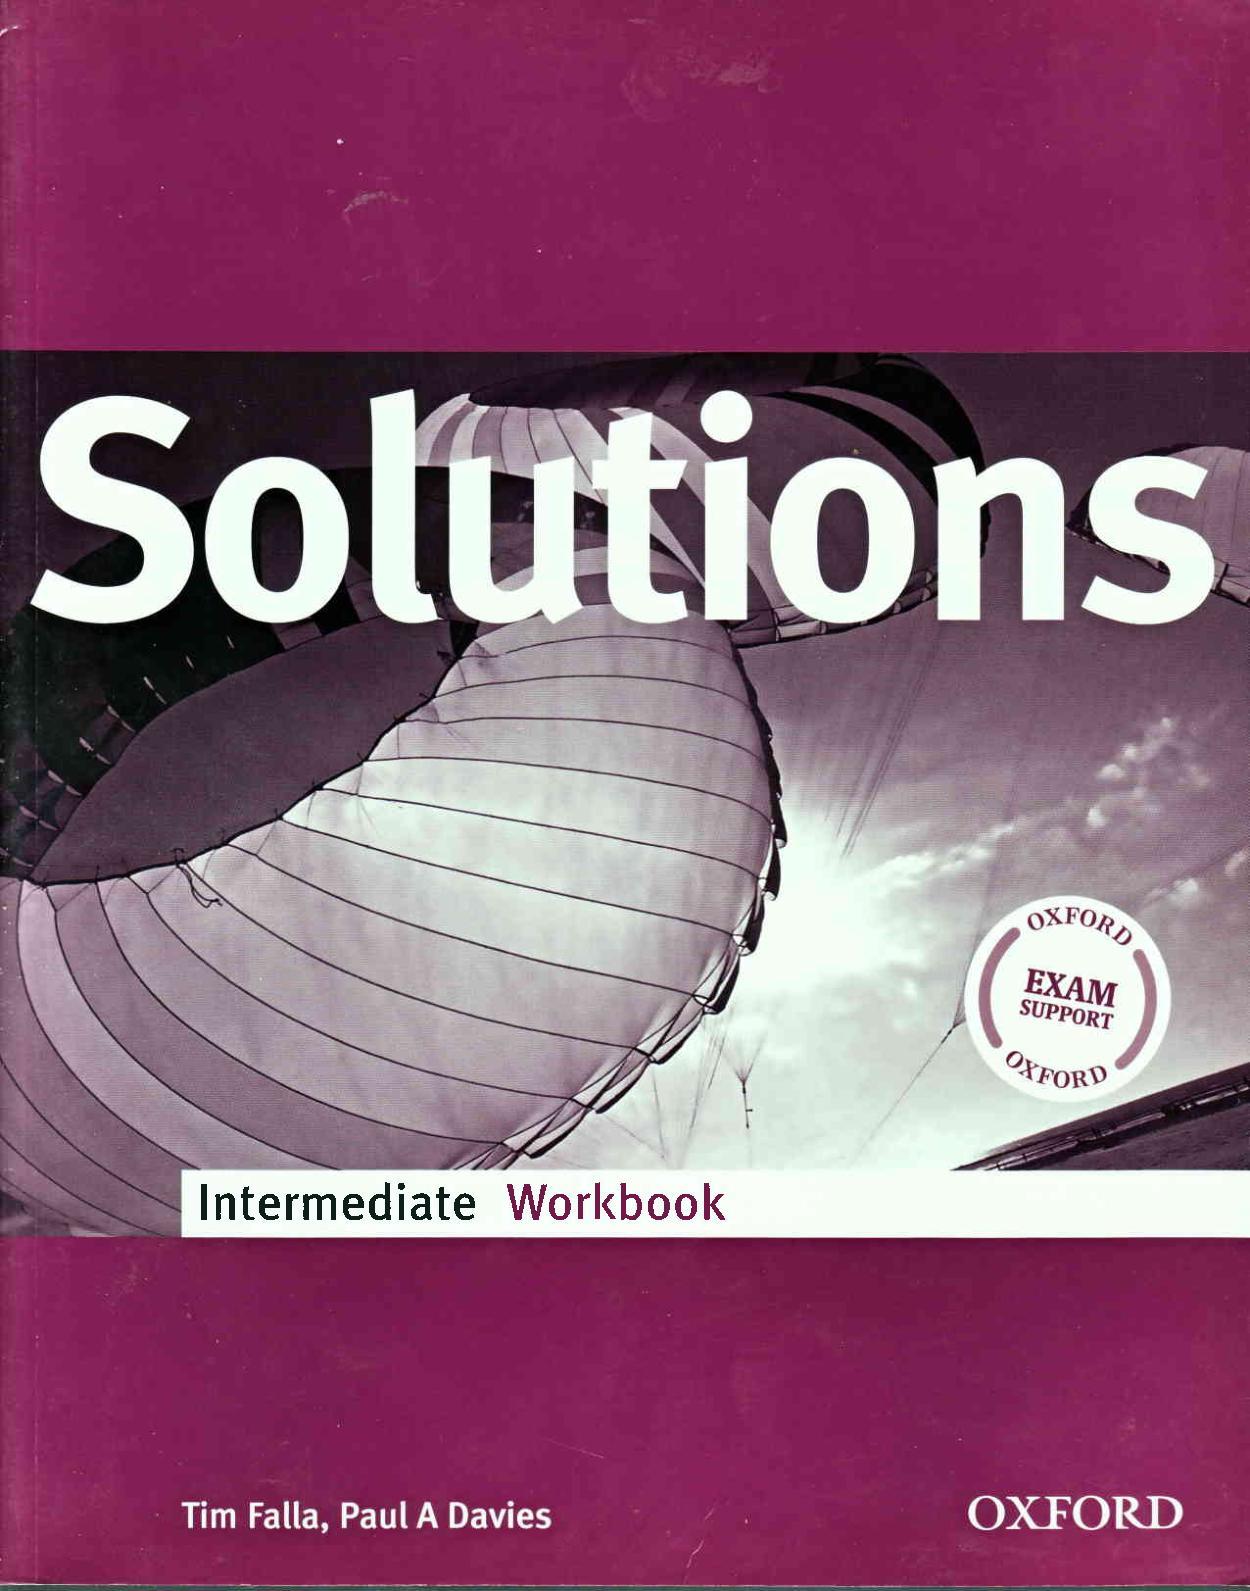 Calaméo - 5solutions Intermediate Workbook